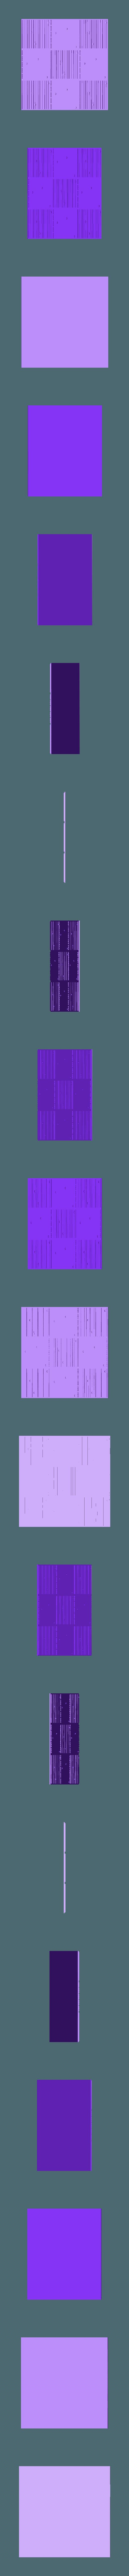 3X3_minimal_wood_floor.stl Download free STL file Minimalist Flooring • 3D printer template, mrhers2